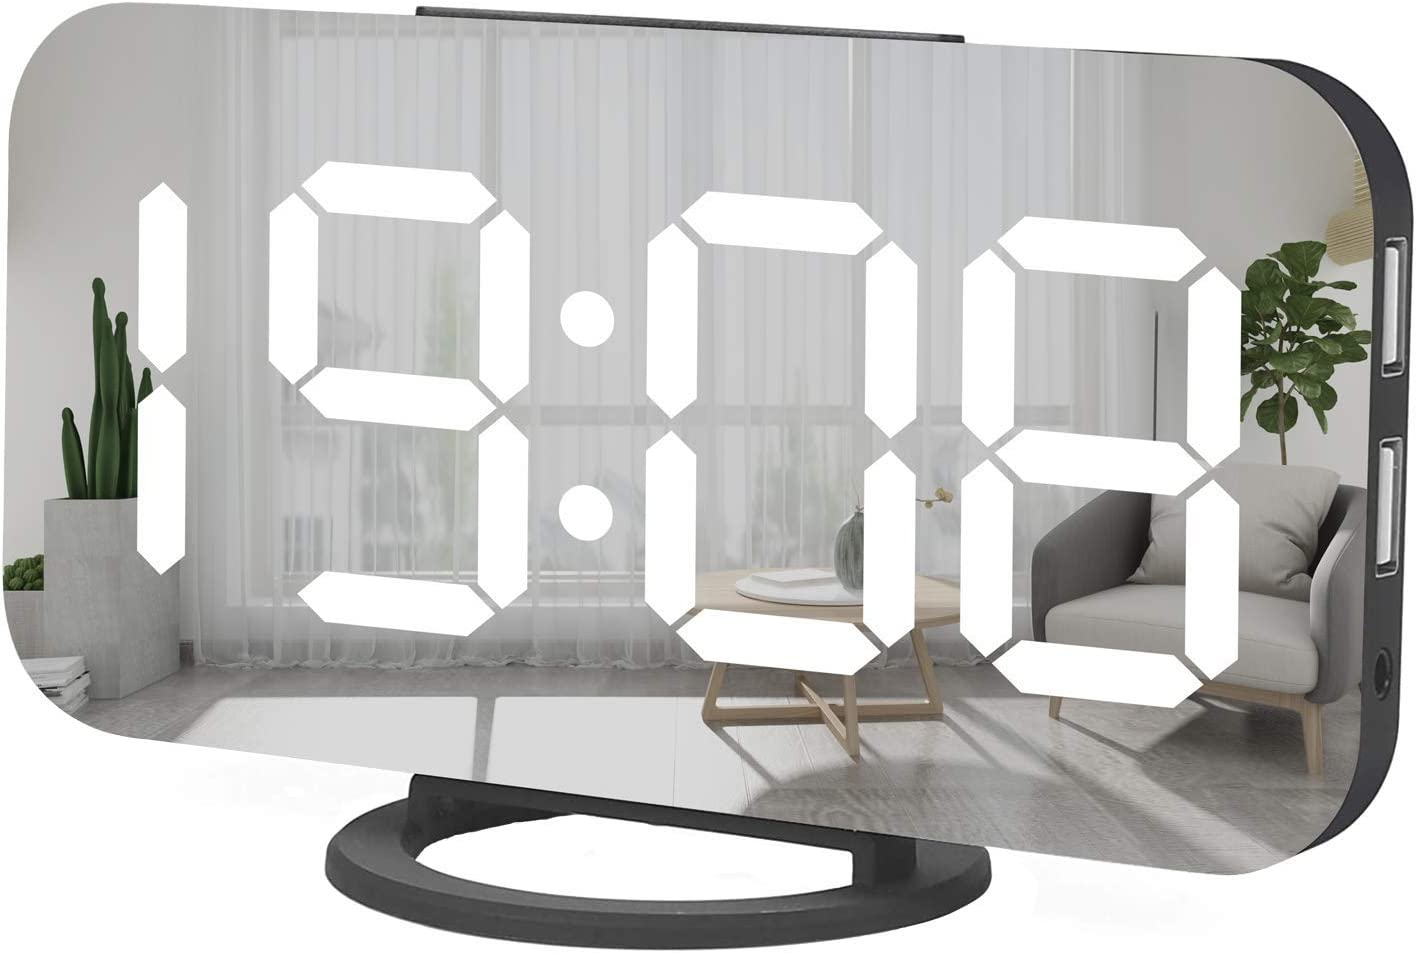 Miowachi Digital Alarm Clock,Large Mirrored LED Clock,Snooze,Dim Night Light 2 USB Charger Ports Desk Alarm Clocks for Bedroom Decor (Black)